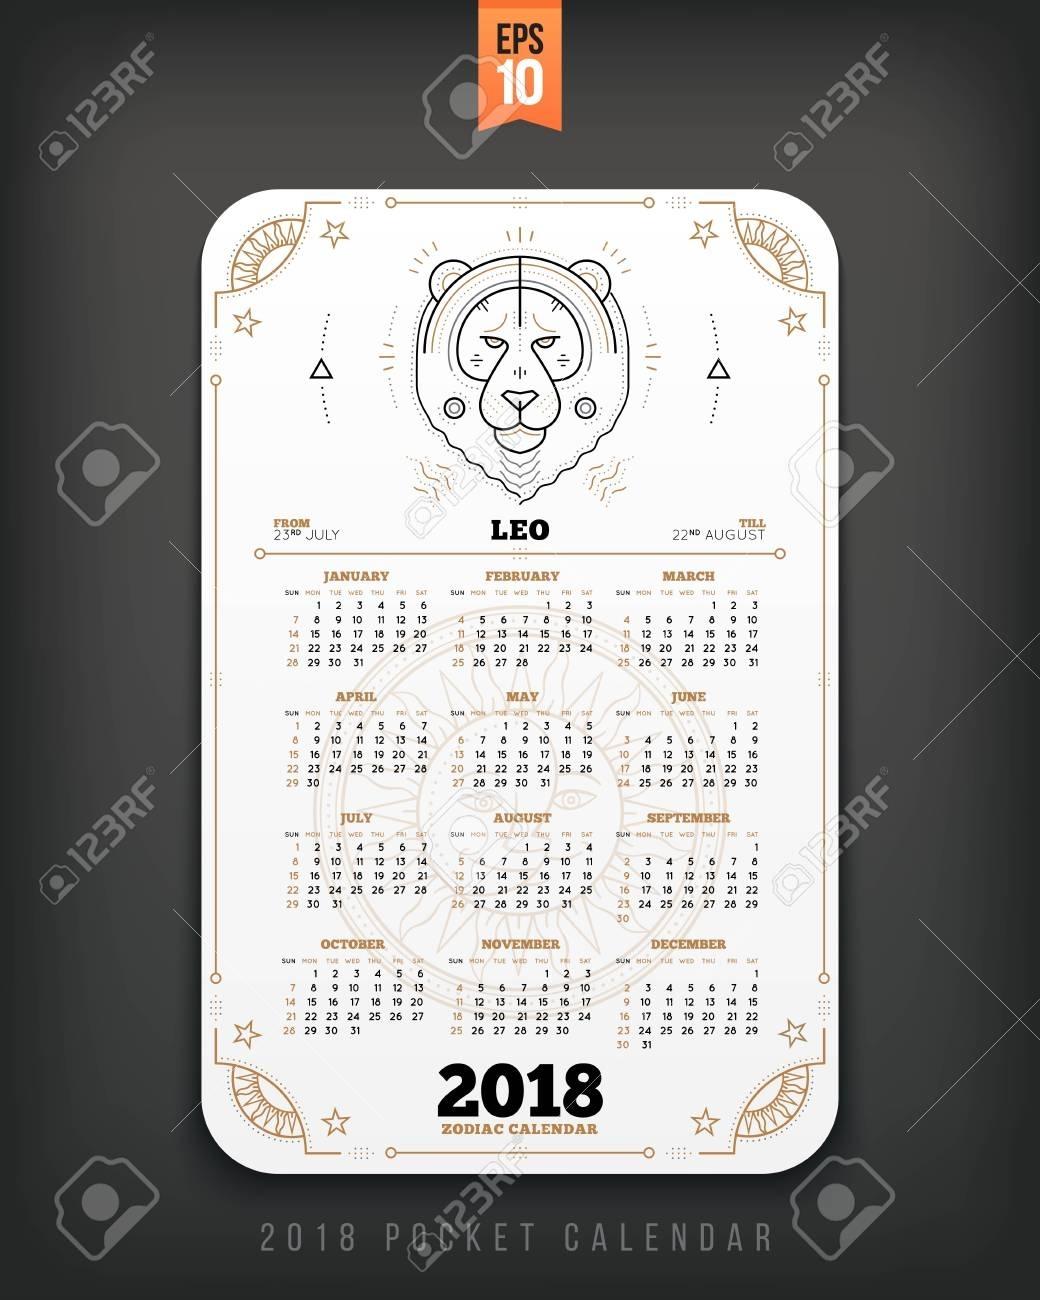 Leo 2018 Year Zodiac Calendar Pocket Size Vertical Layout. White..